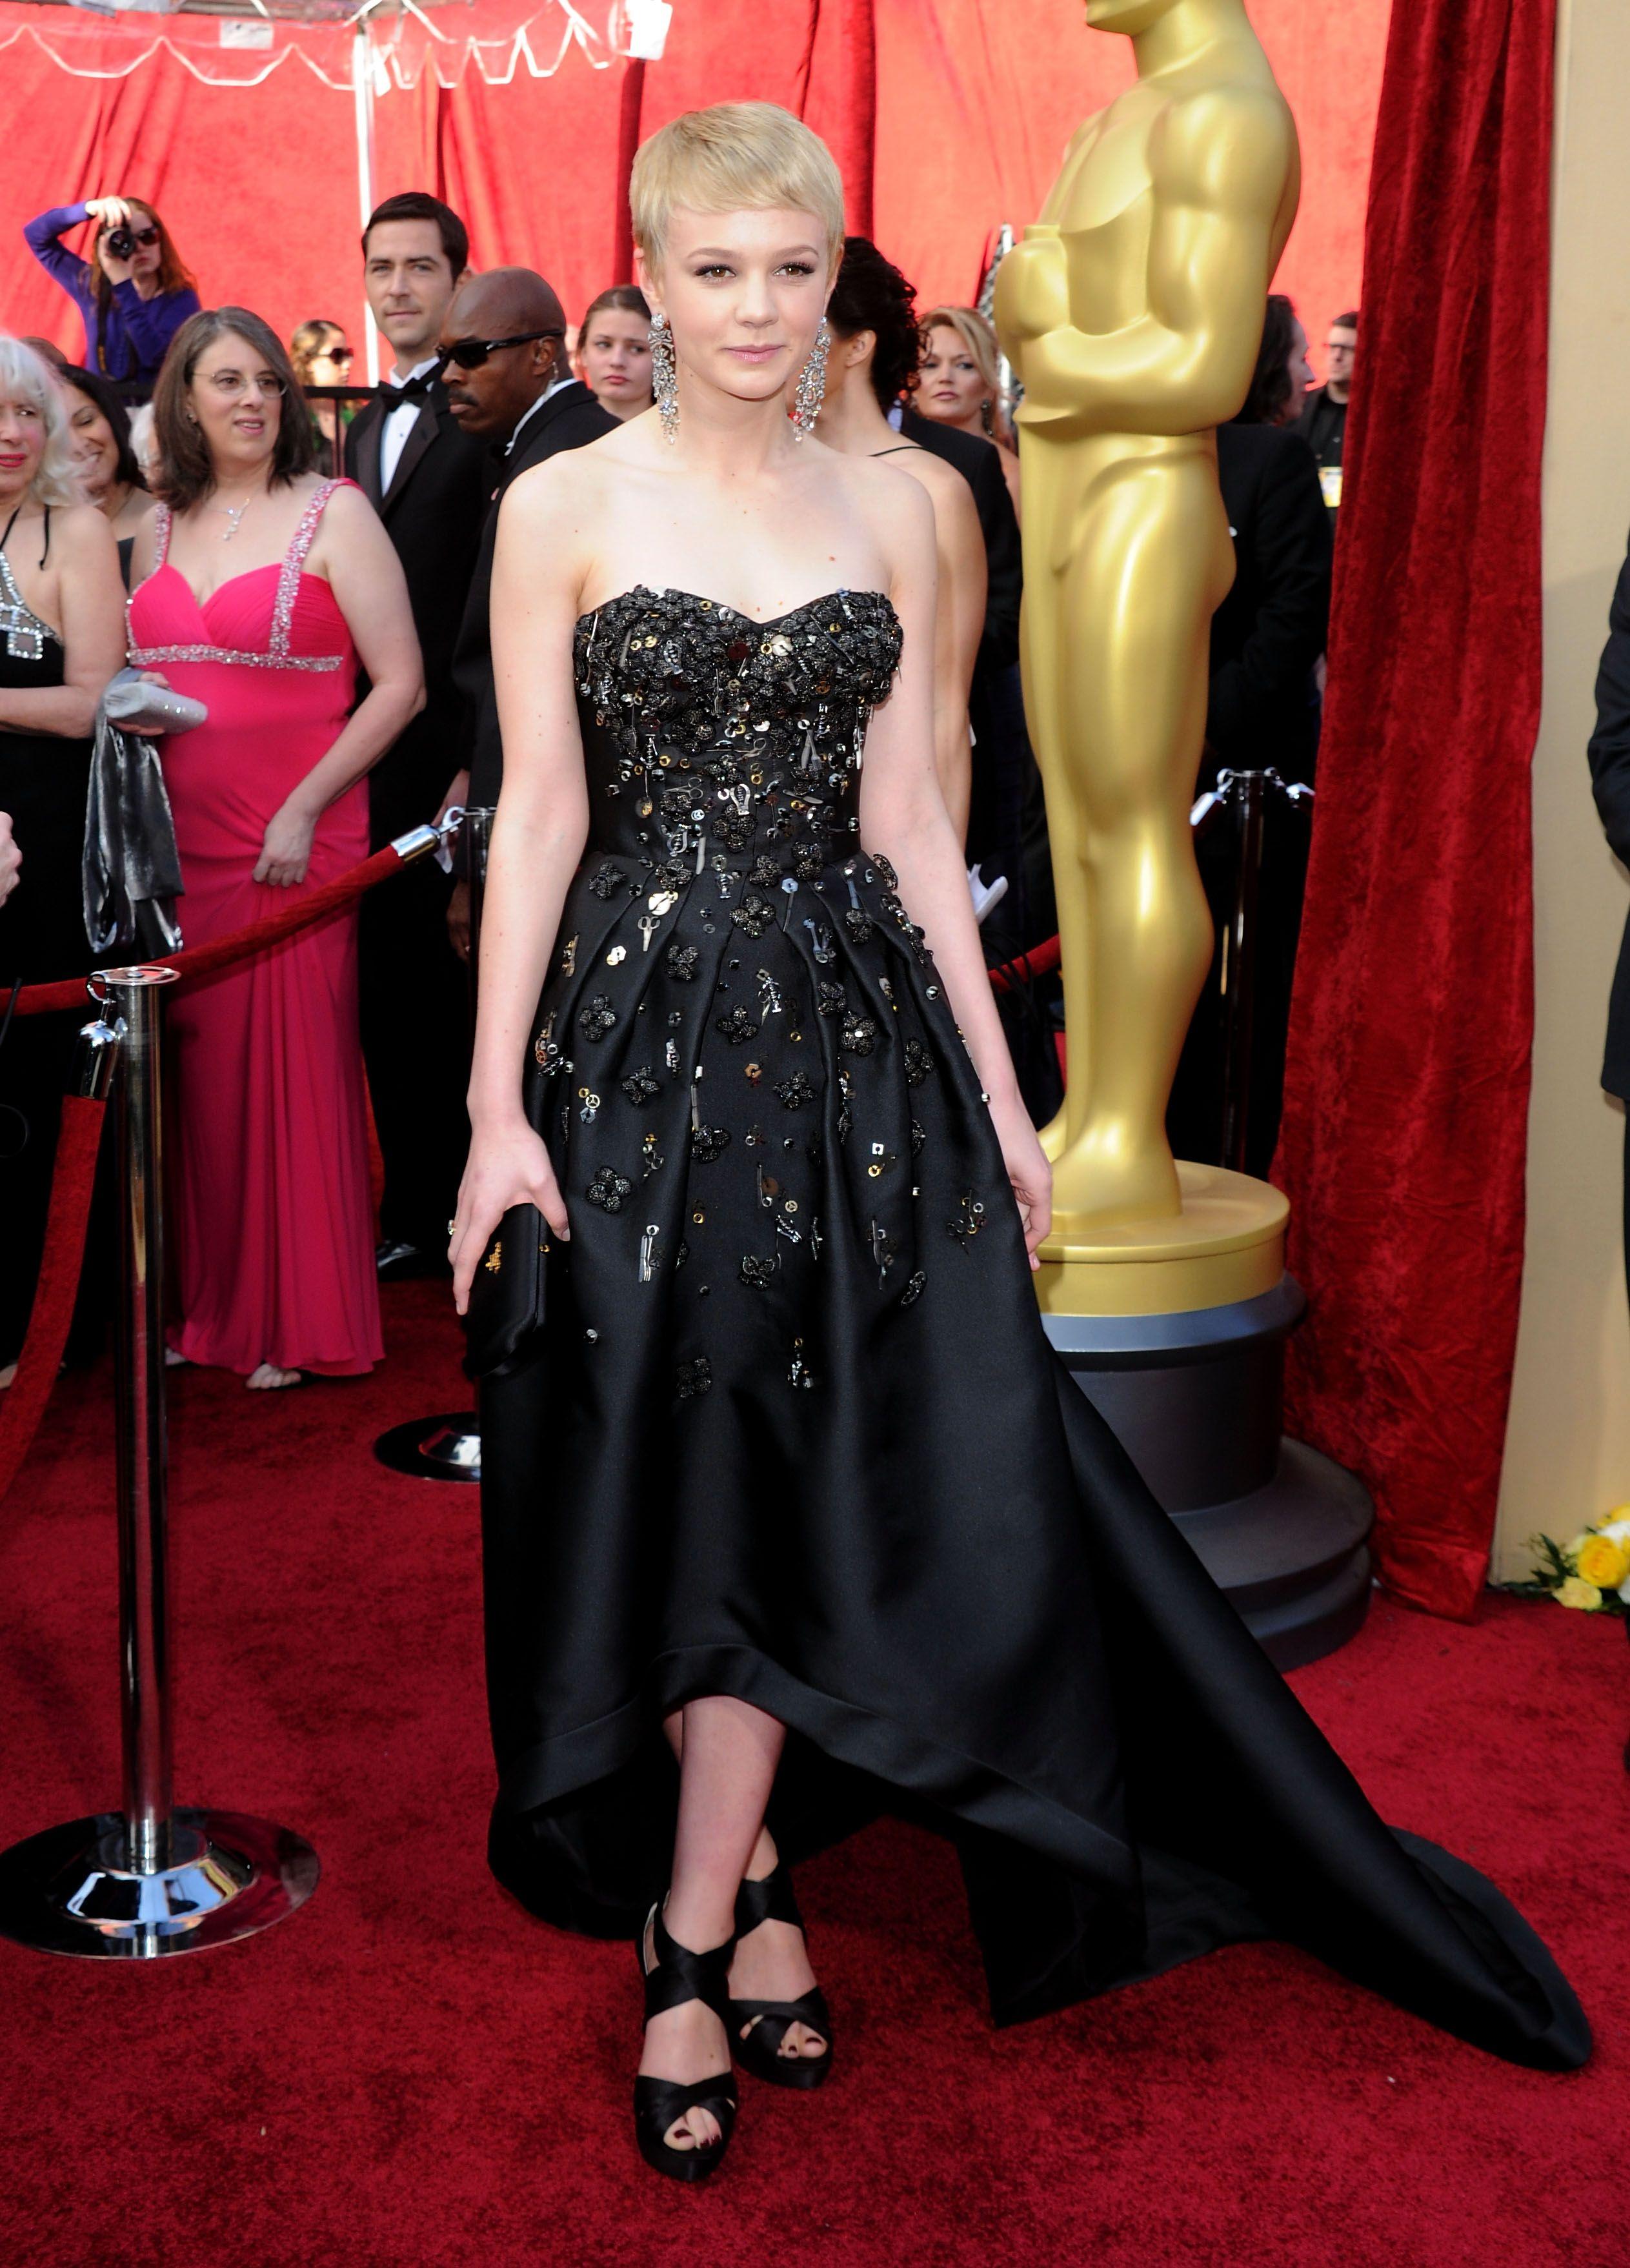 Carey Mulligan in Prada at the 2010 Oscars